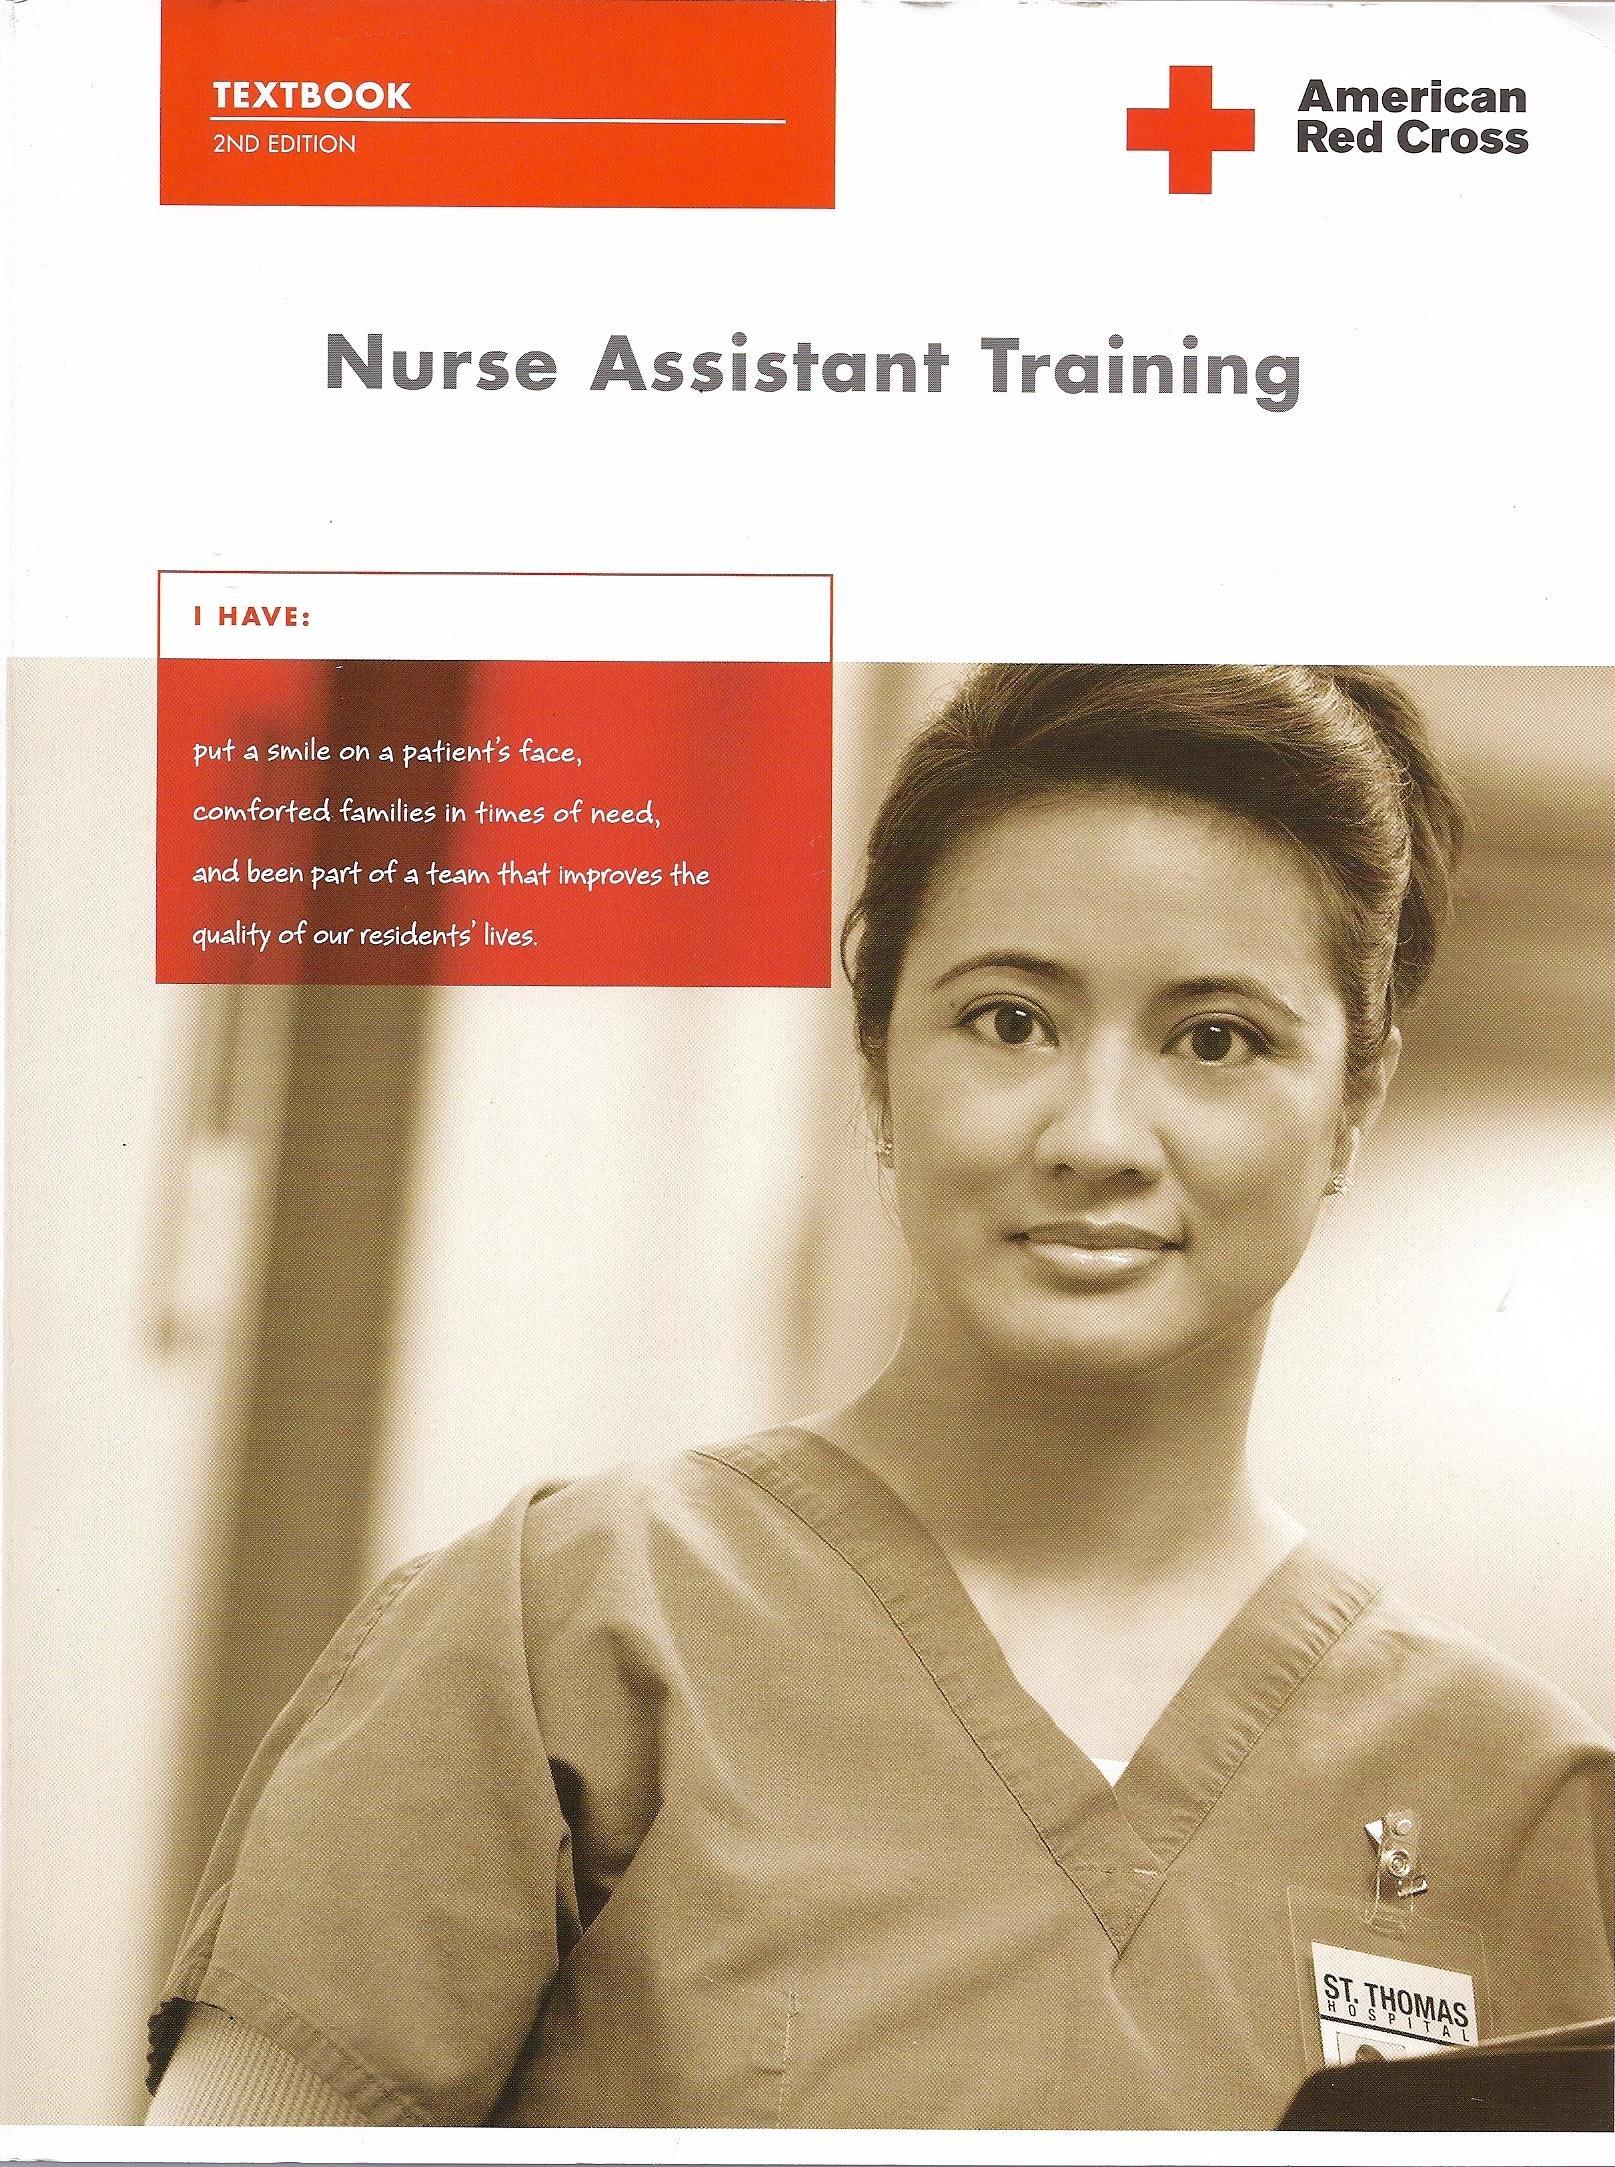 Nurse Assistant Training American Red Cross 9781584804147 Amazon